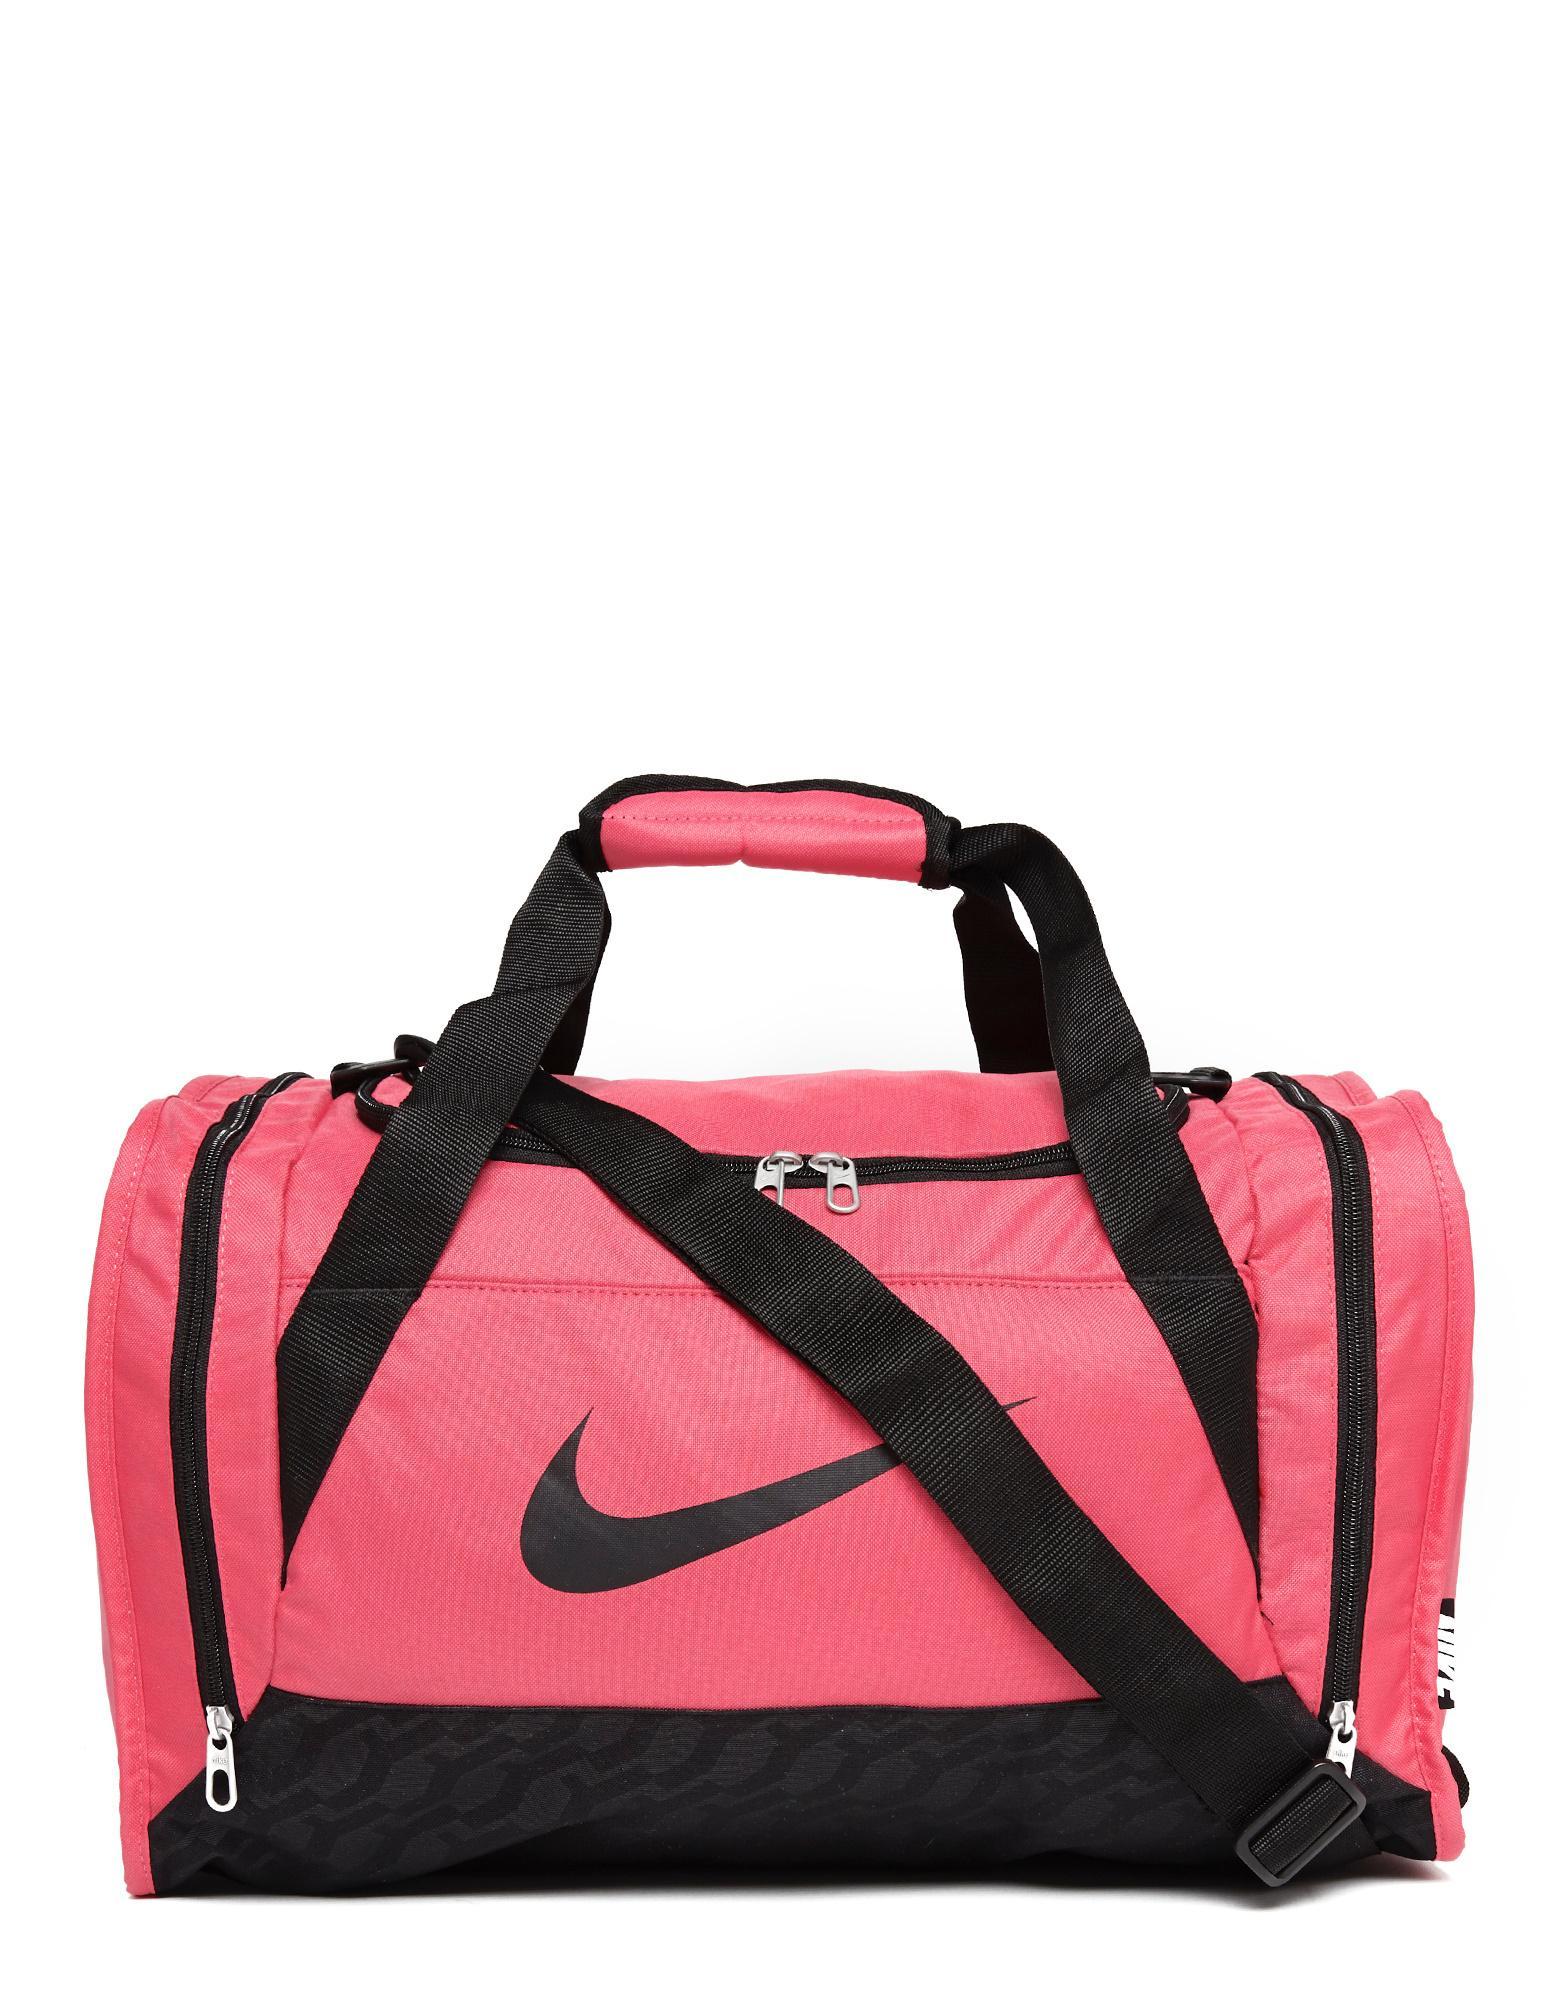 nike air max pink and black jd duffel